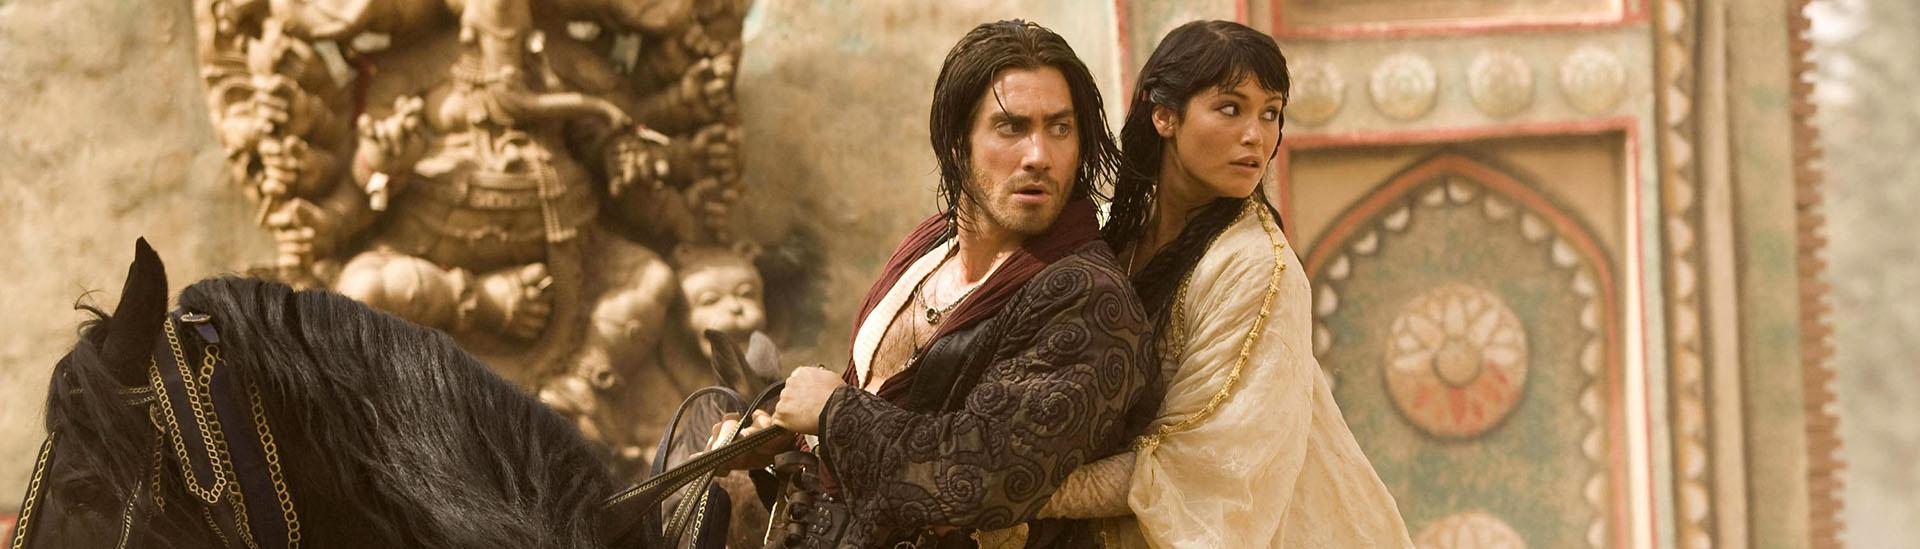 Baner filmu 'Książę Persji: Piaski Czasu'